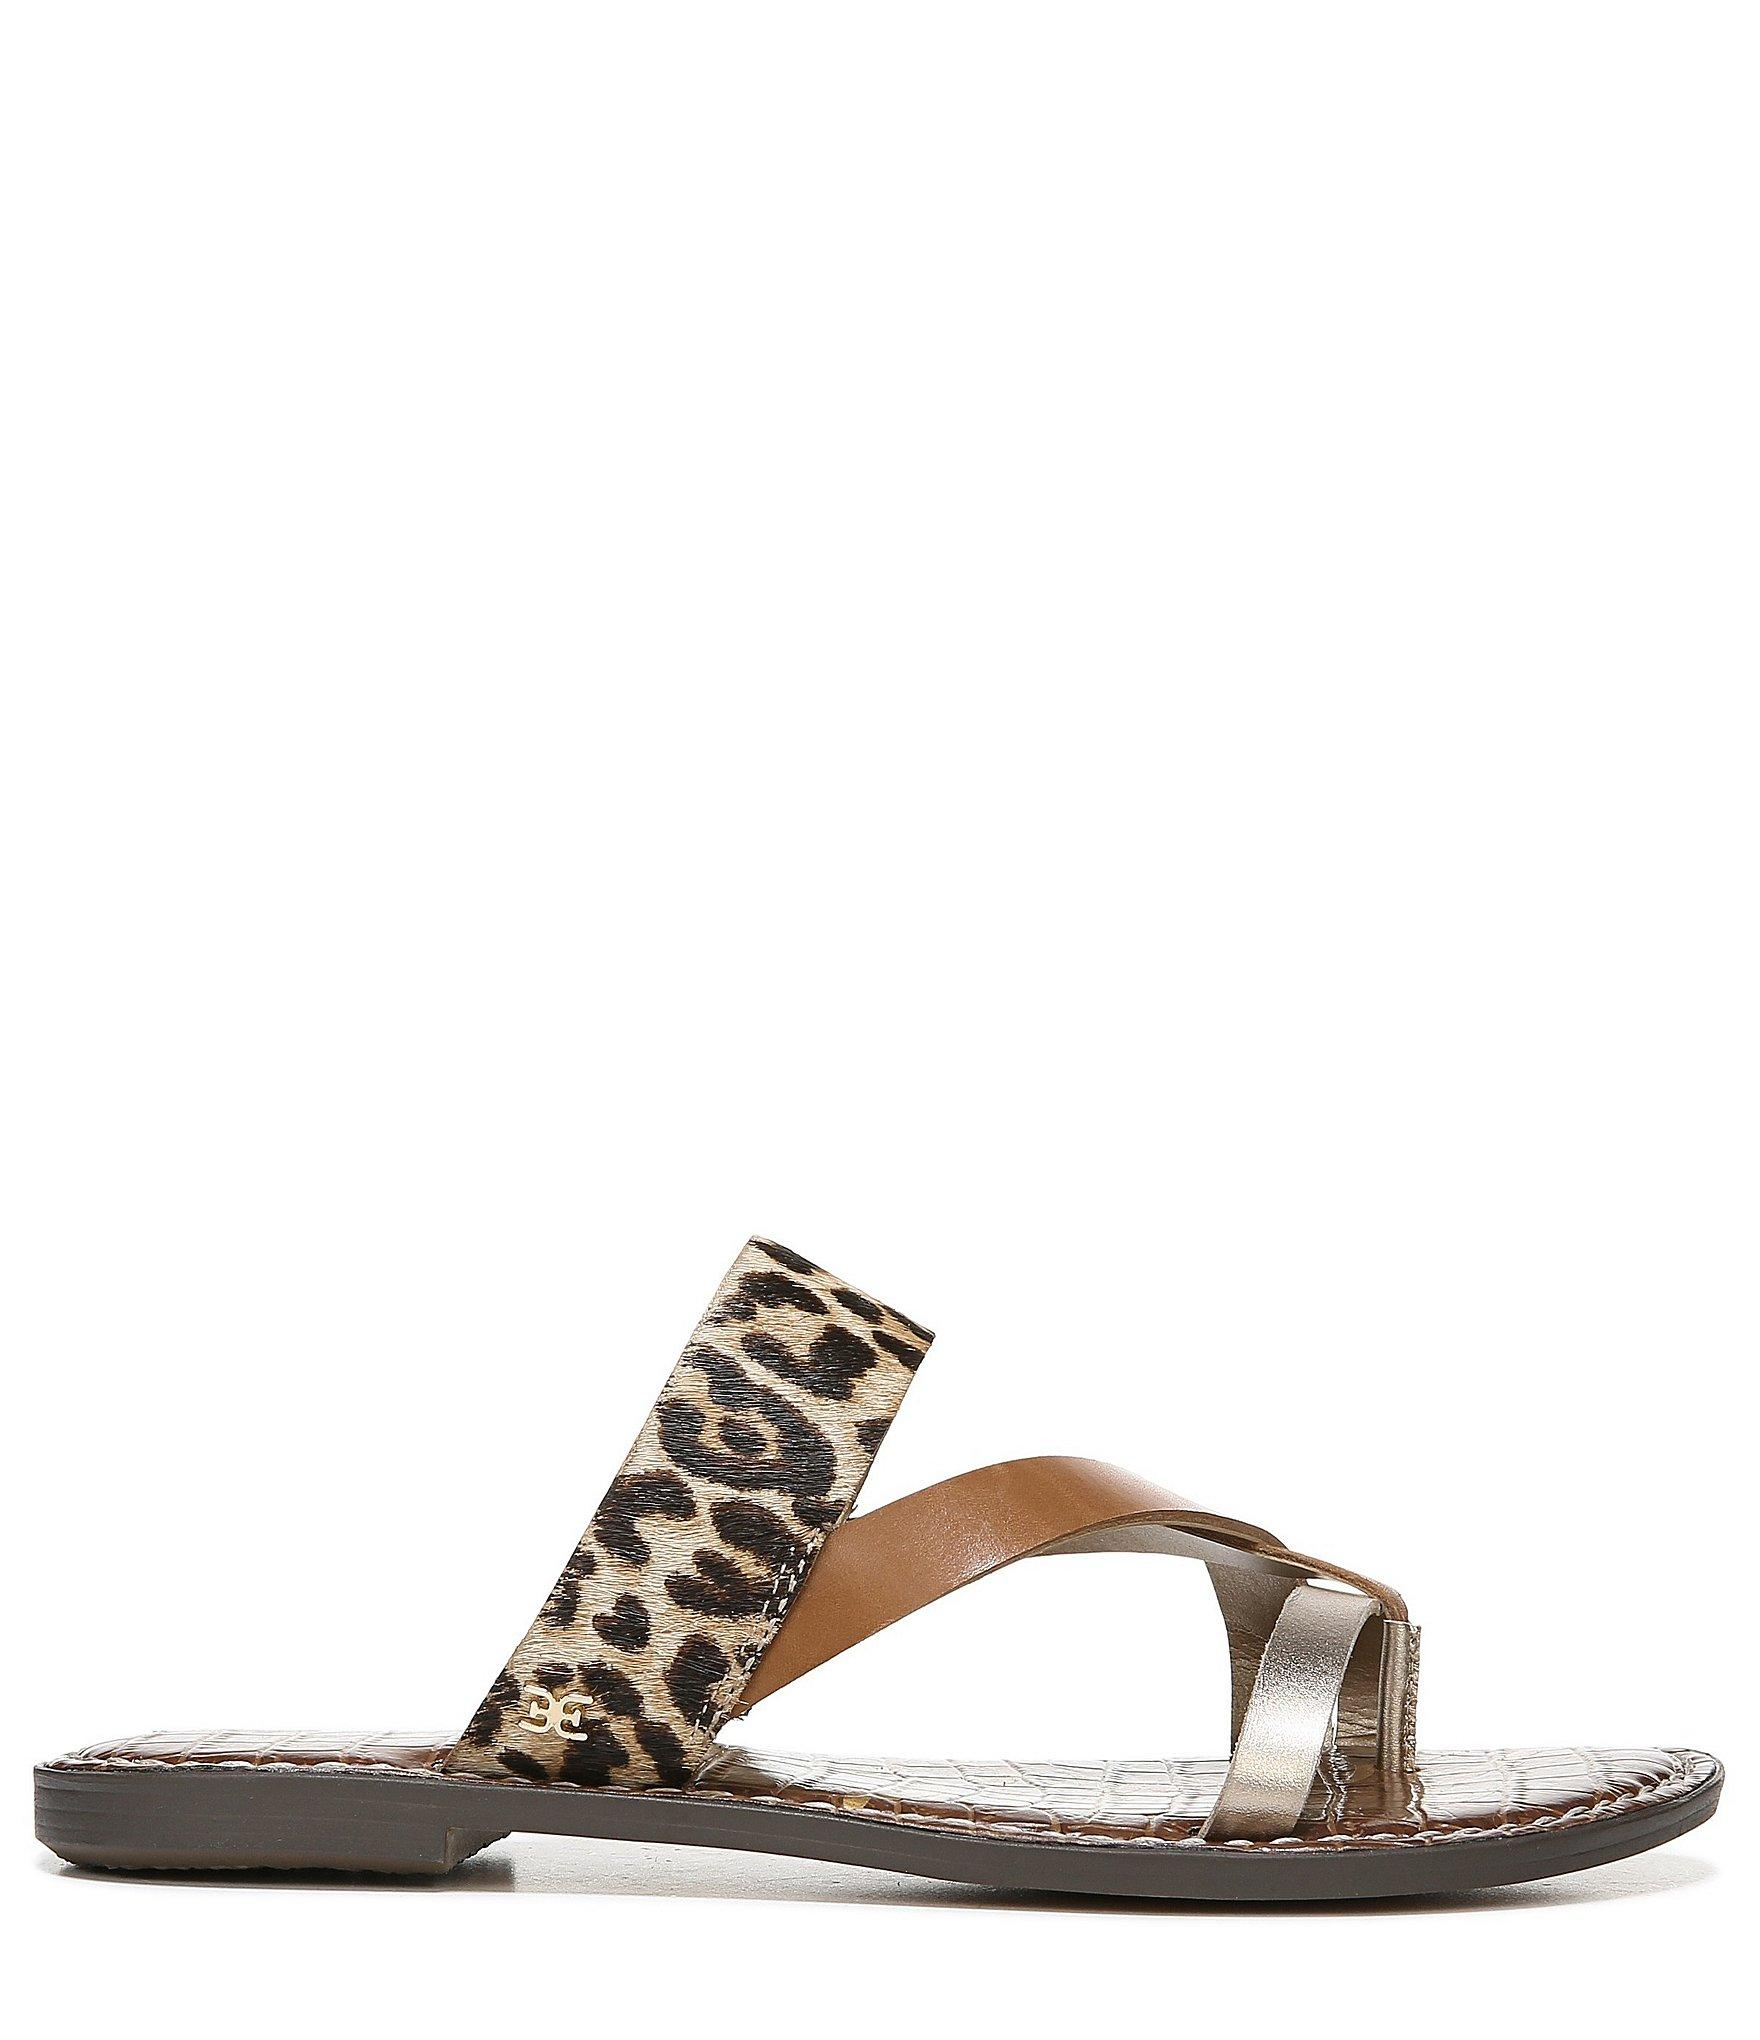 5532dc5ff6bf8b Sam Edelman - Multicolor Gael Leather   Leopard Print Calf Hair Sandals -  Lyst. View fullscreen